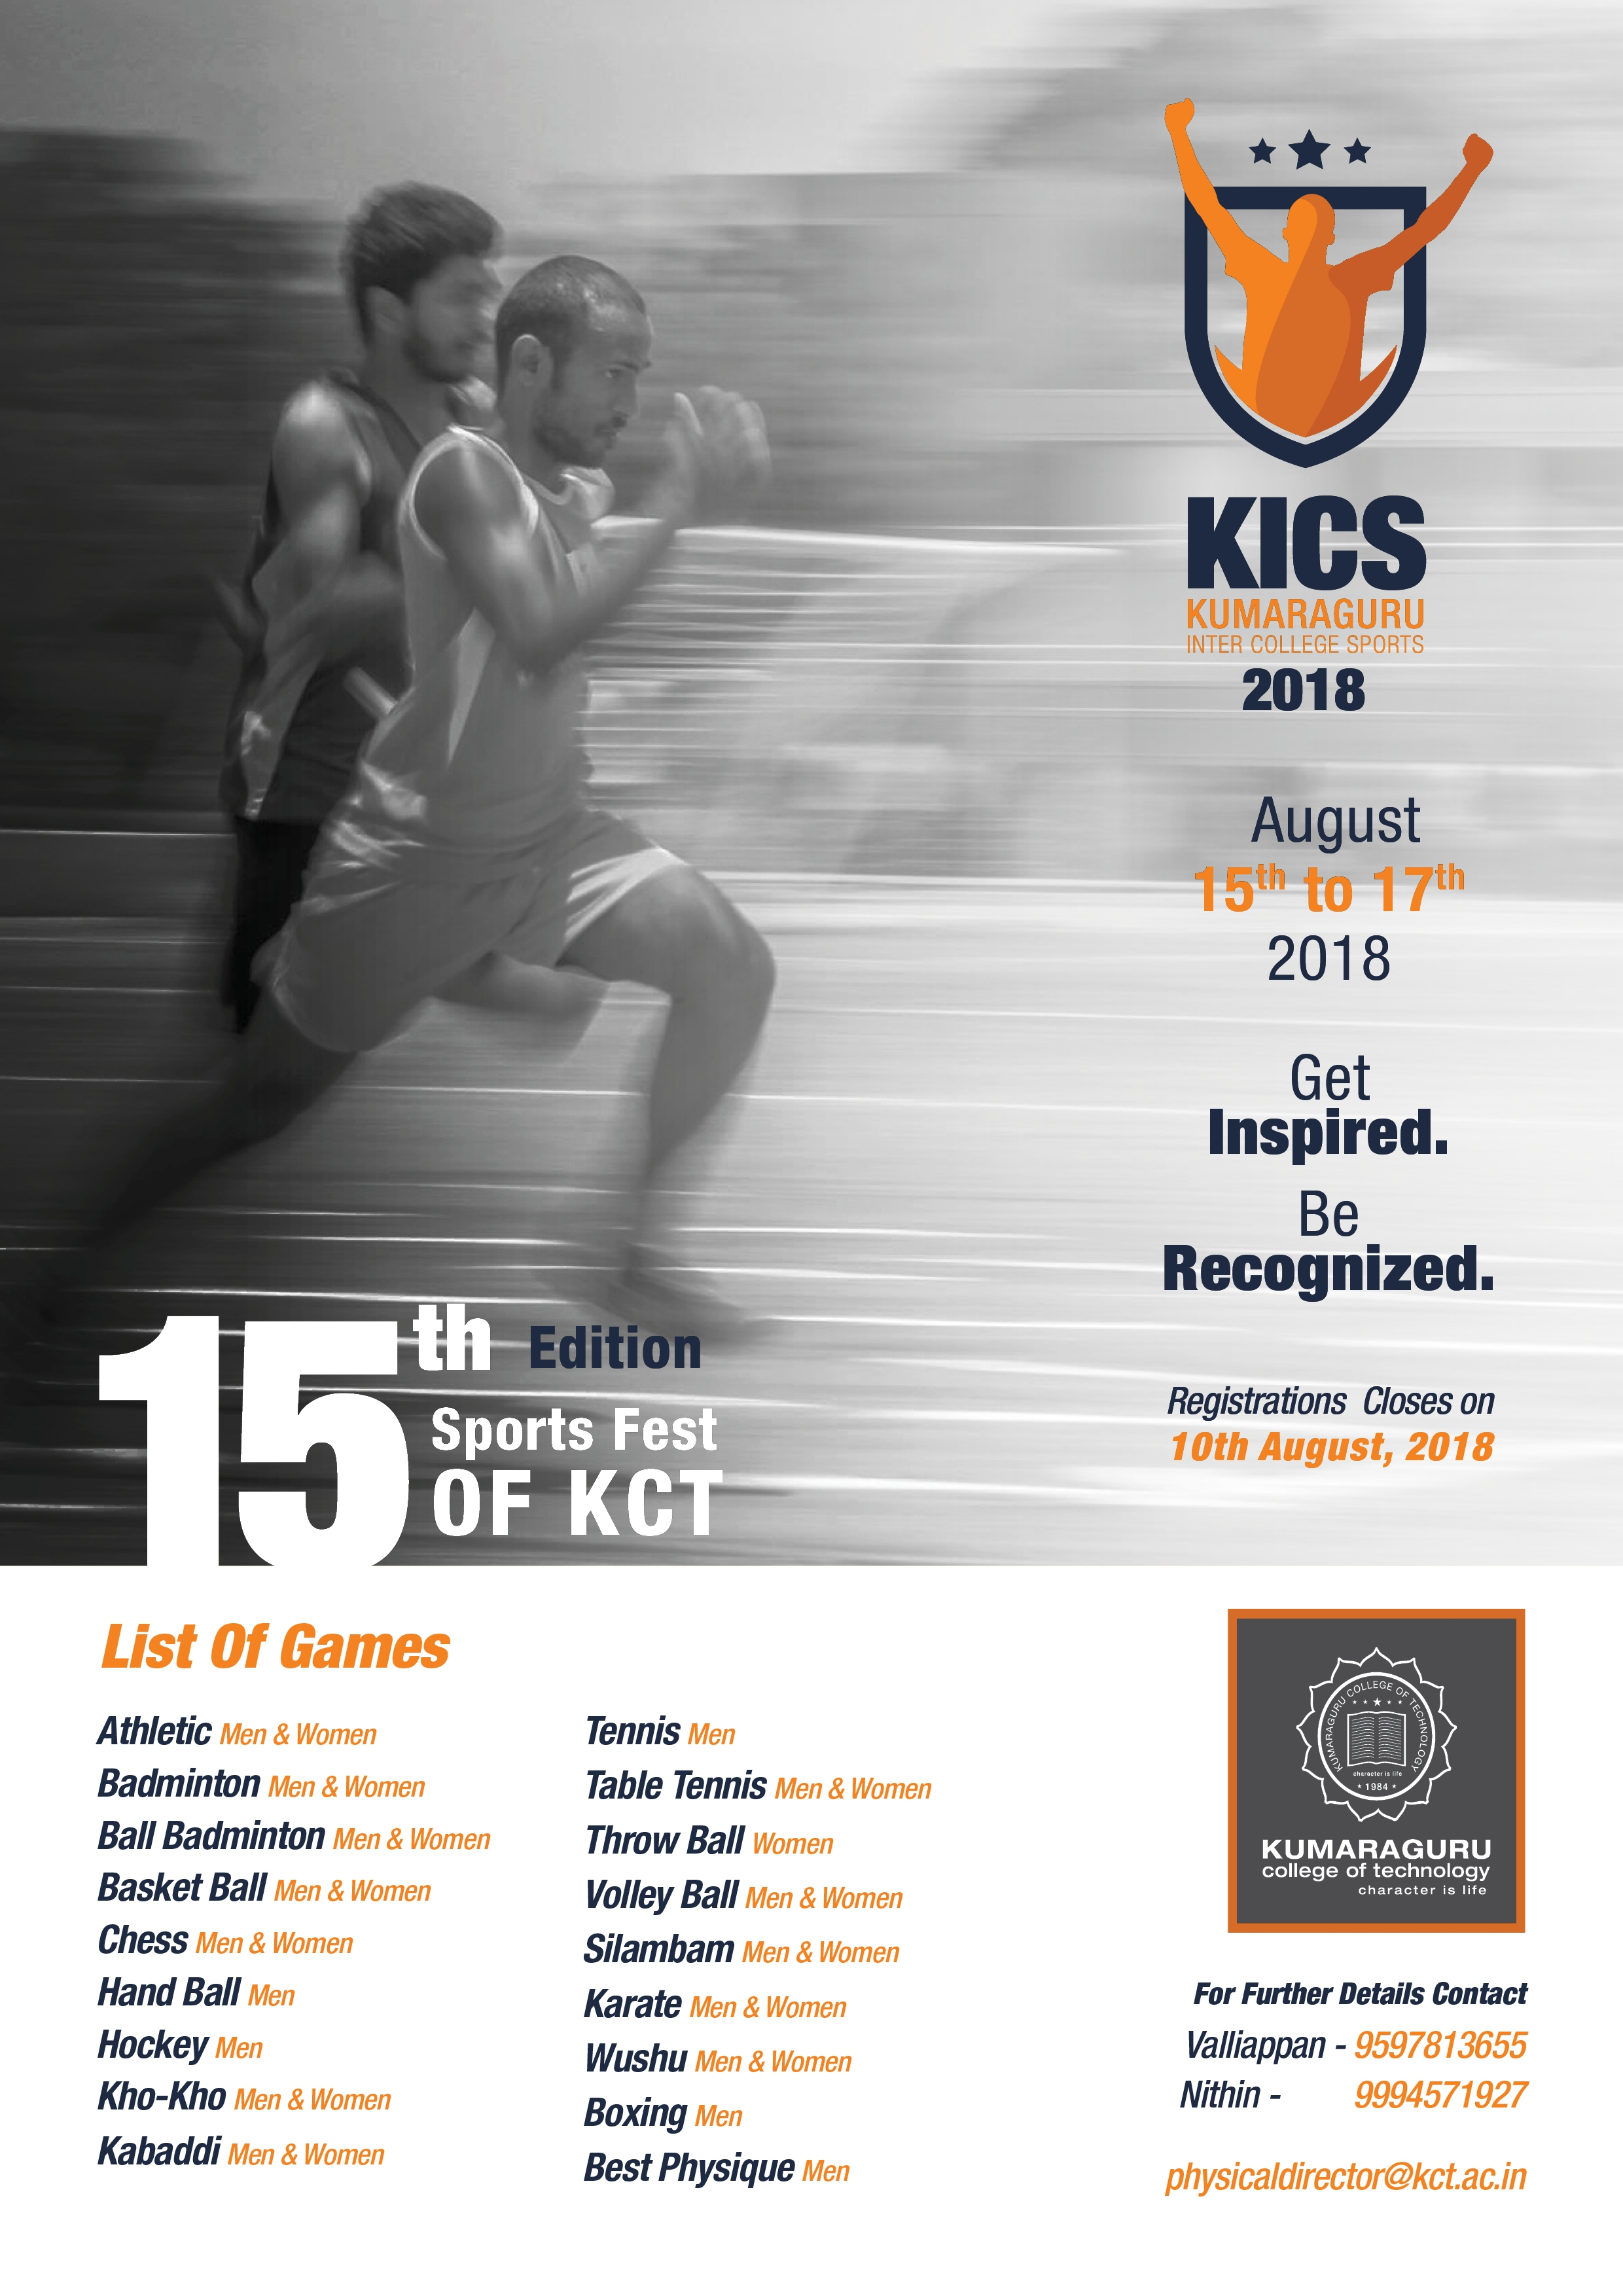 Kumaraguru Inter College Sports invite